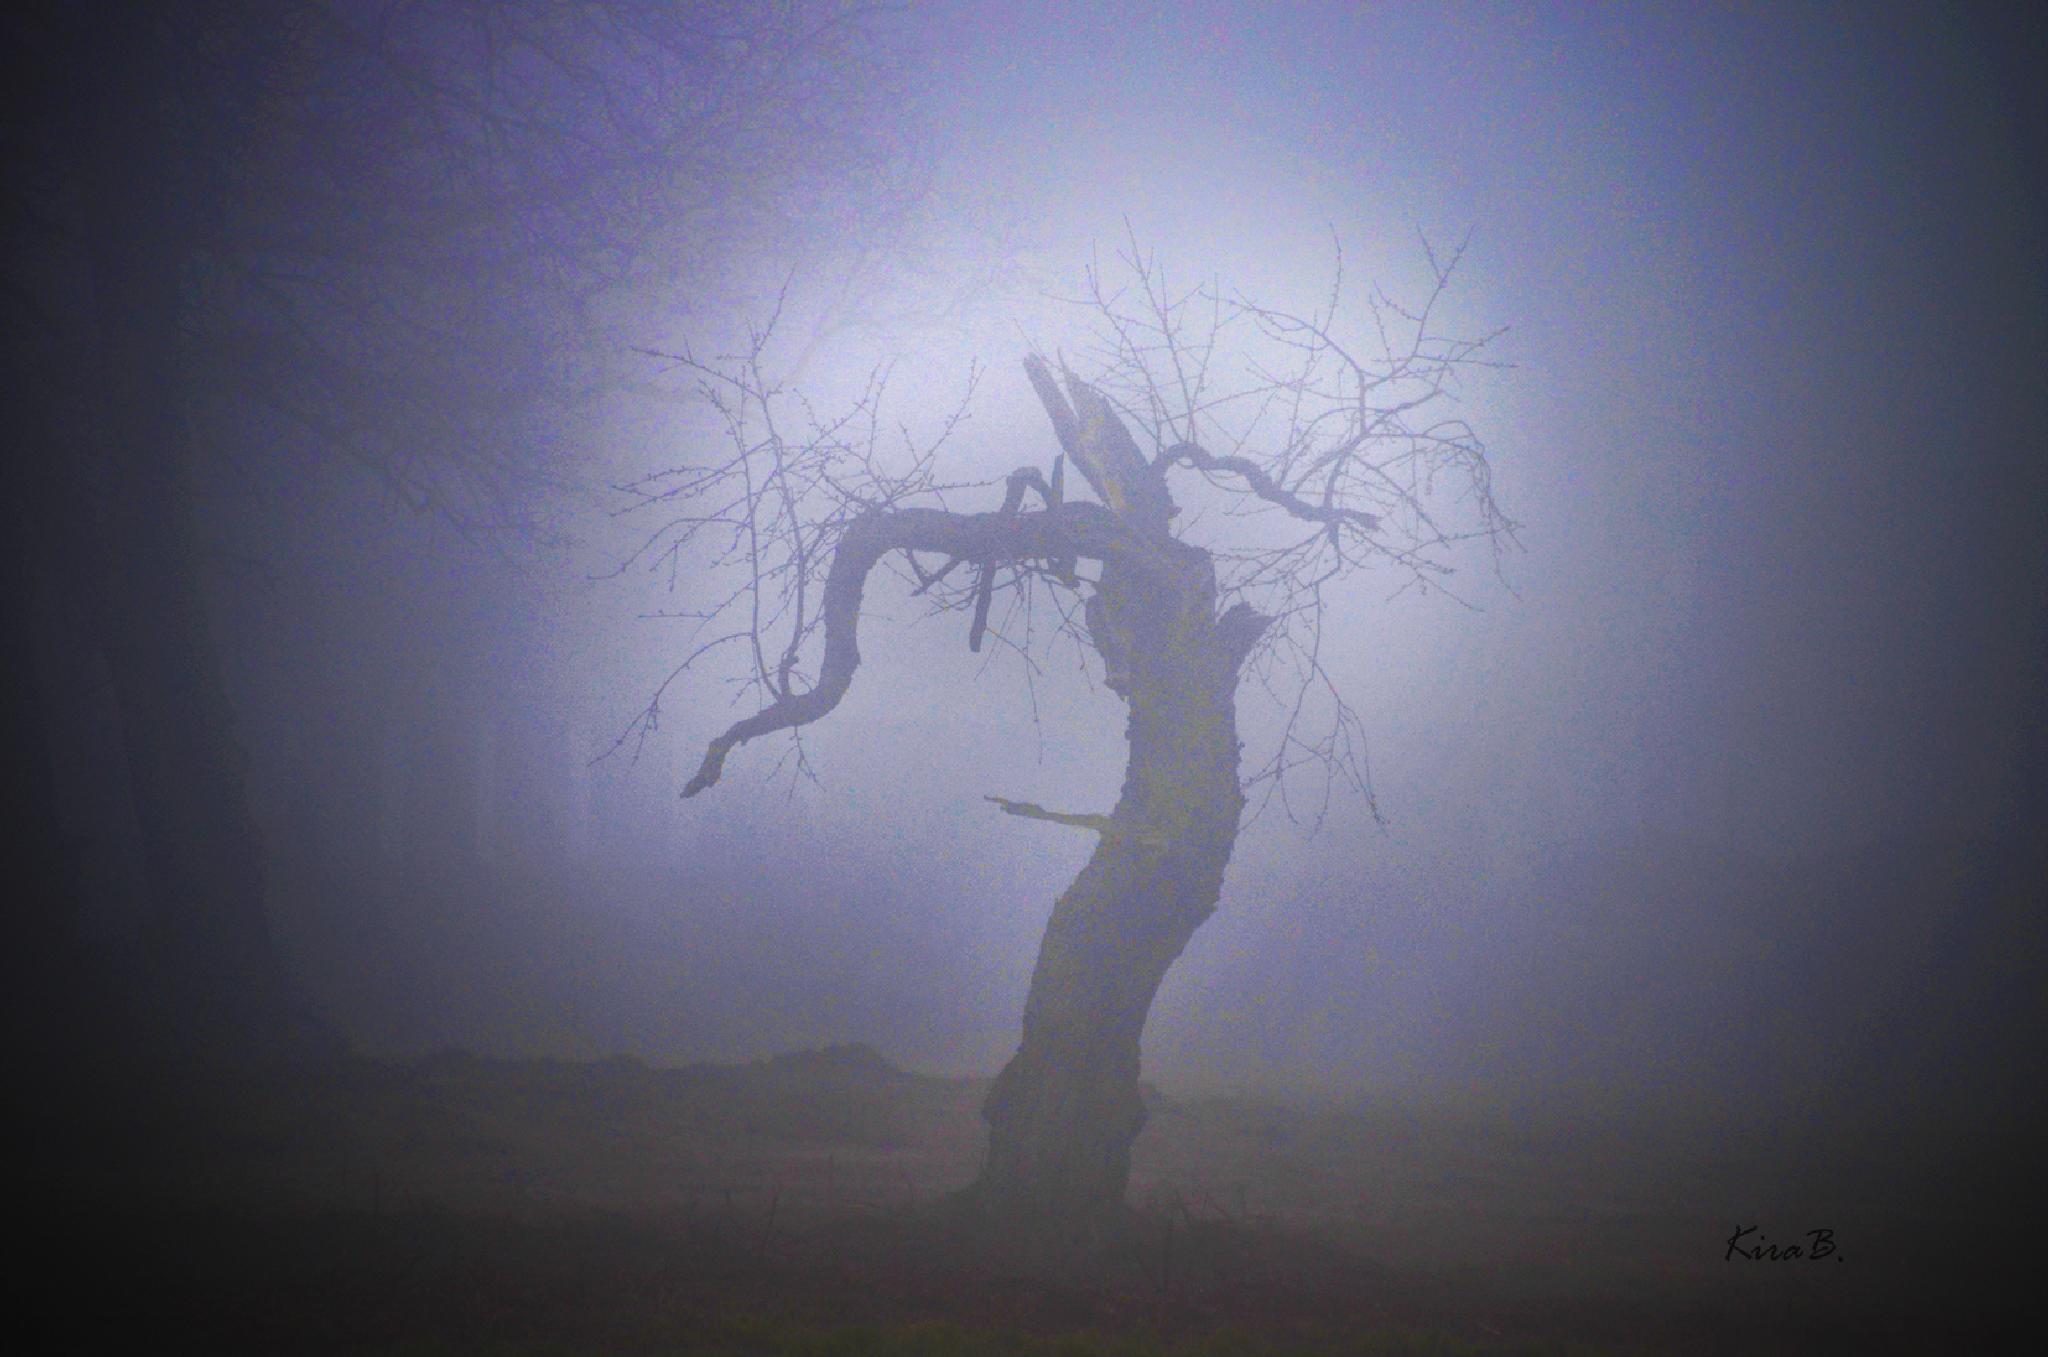 foggy morning by kirabruns